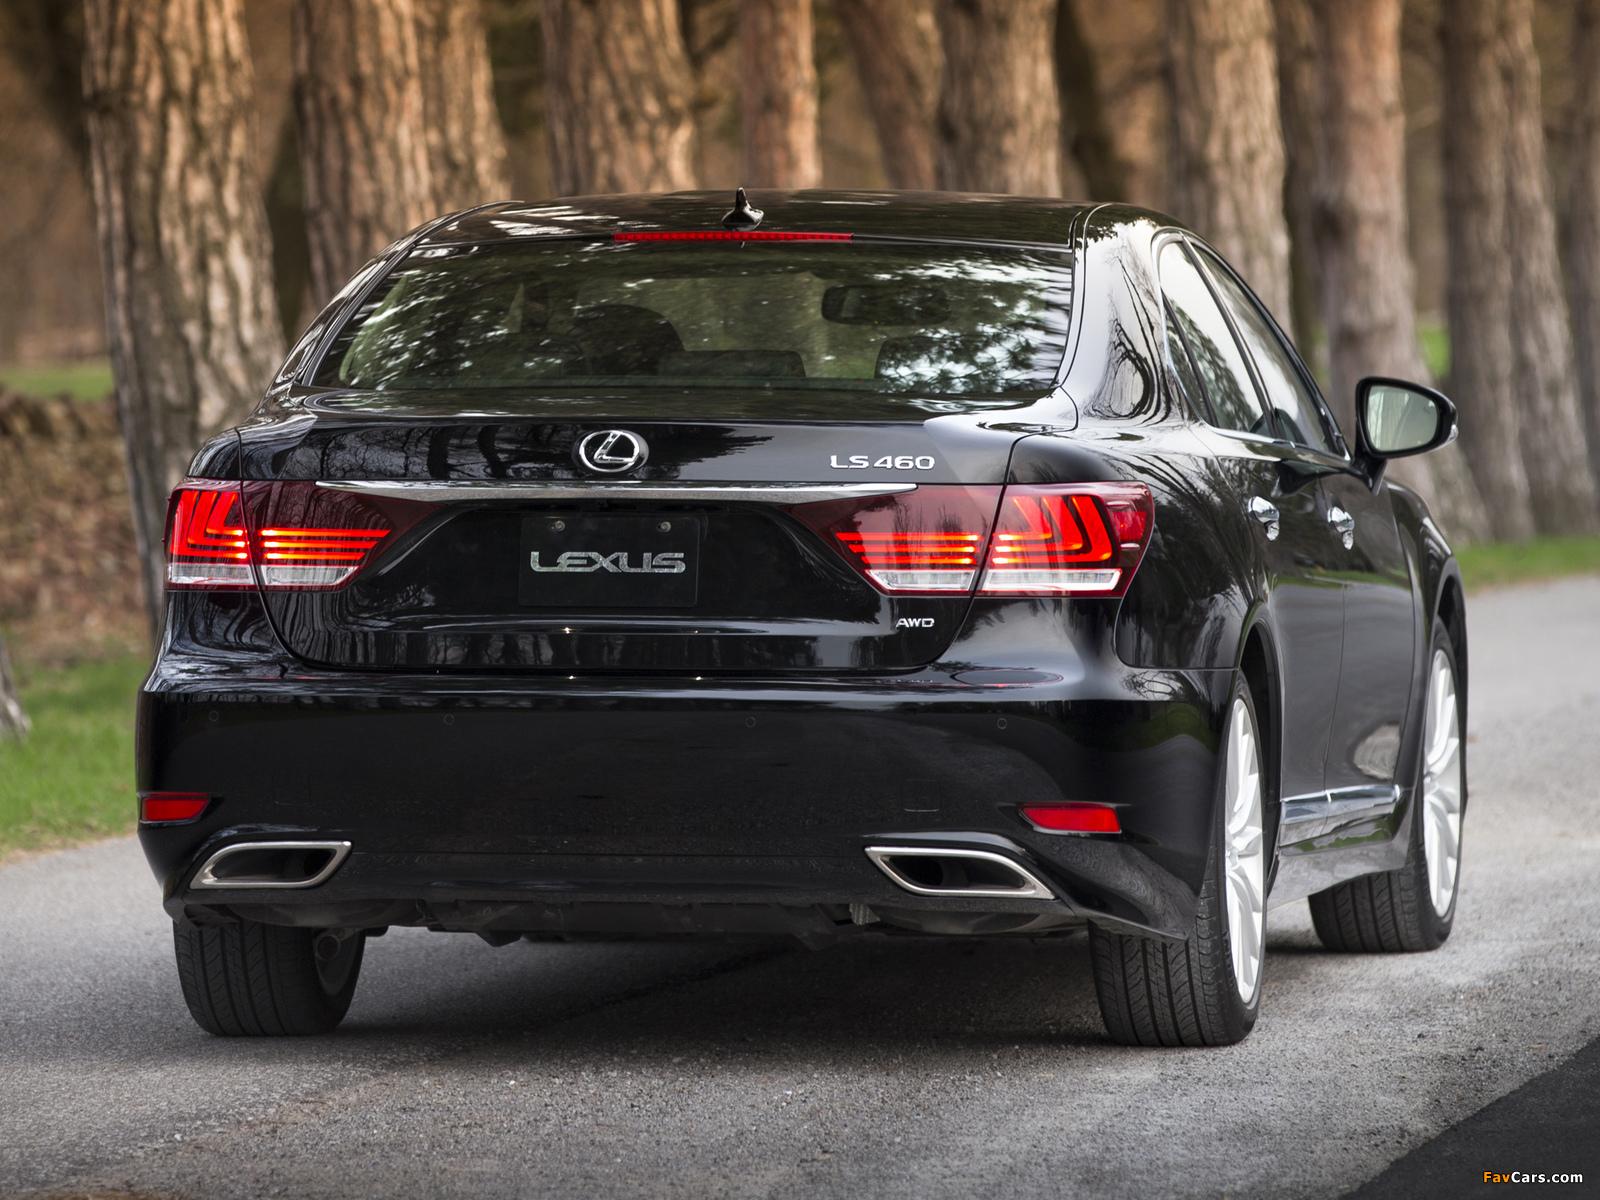 Pictures of Lexus LS 460 AWD 2012 (1600 x 1200)